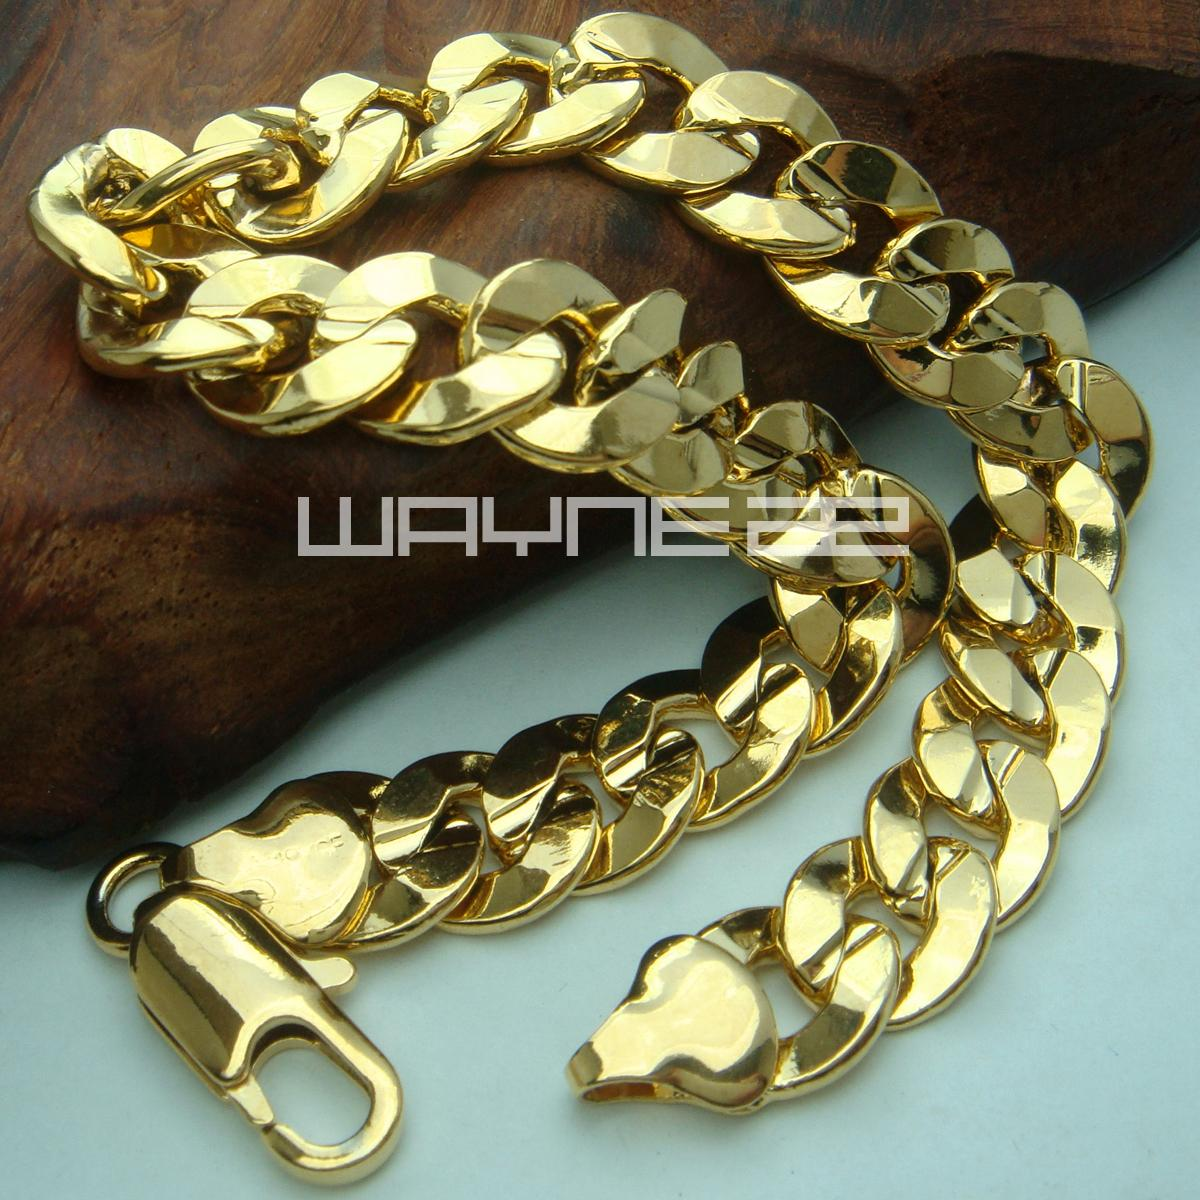 18k yellow Gold GF mens ladies solid bracelet bangle ring links chain B145